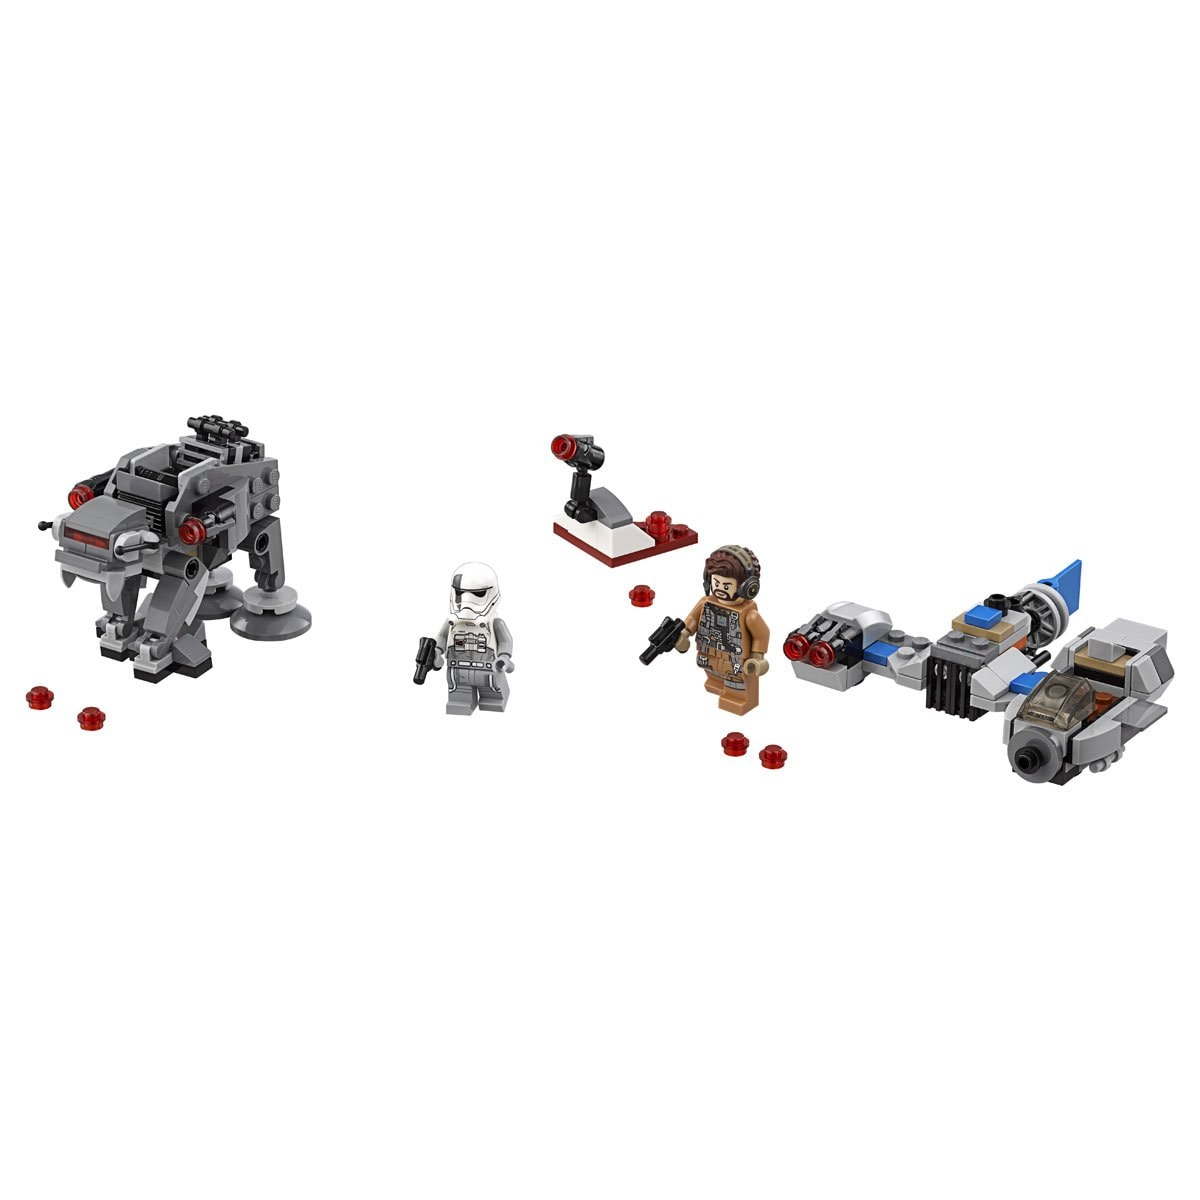 Microfighters Ski Speeder Vs Caminante de la Primera Orden Lego